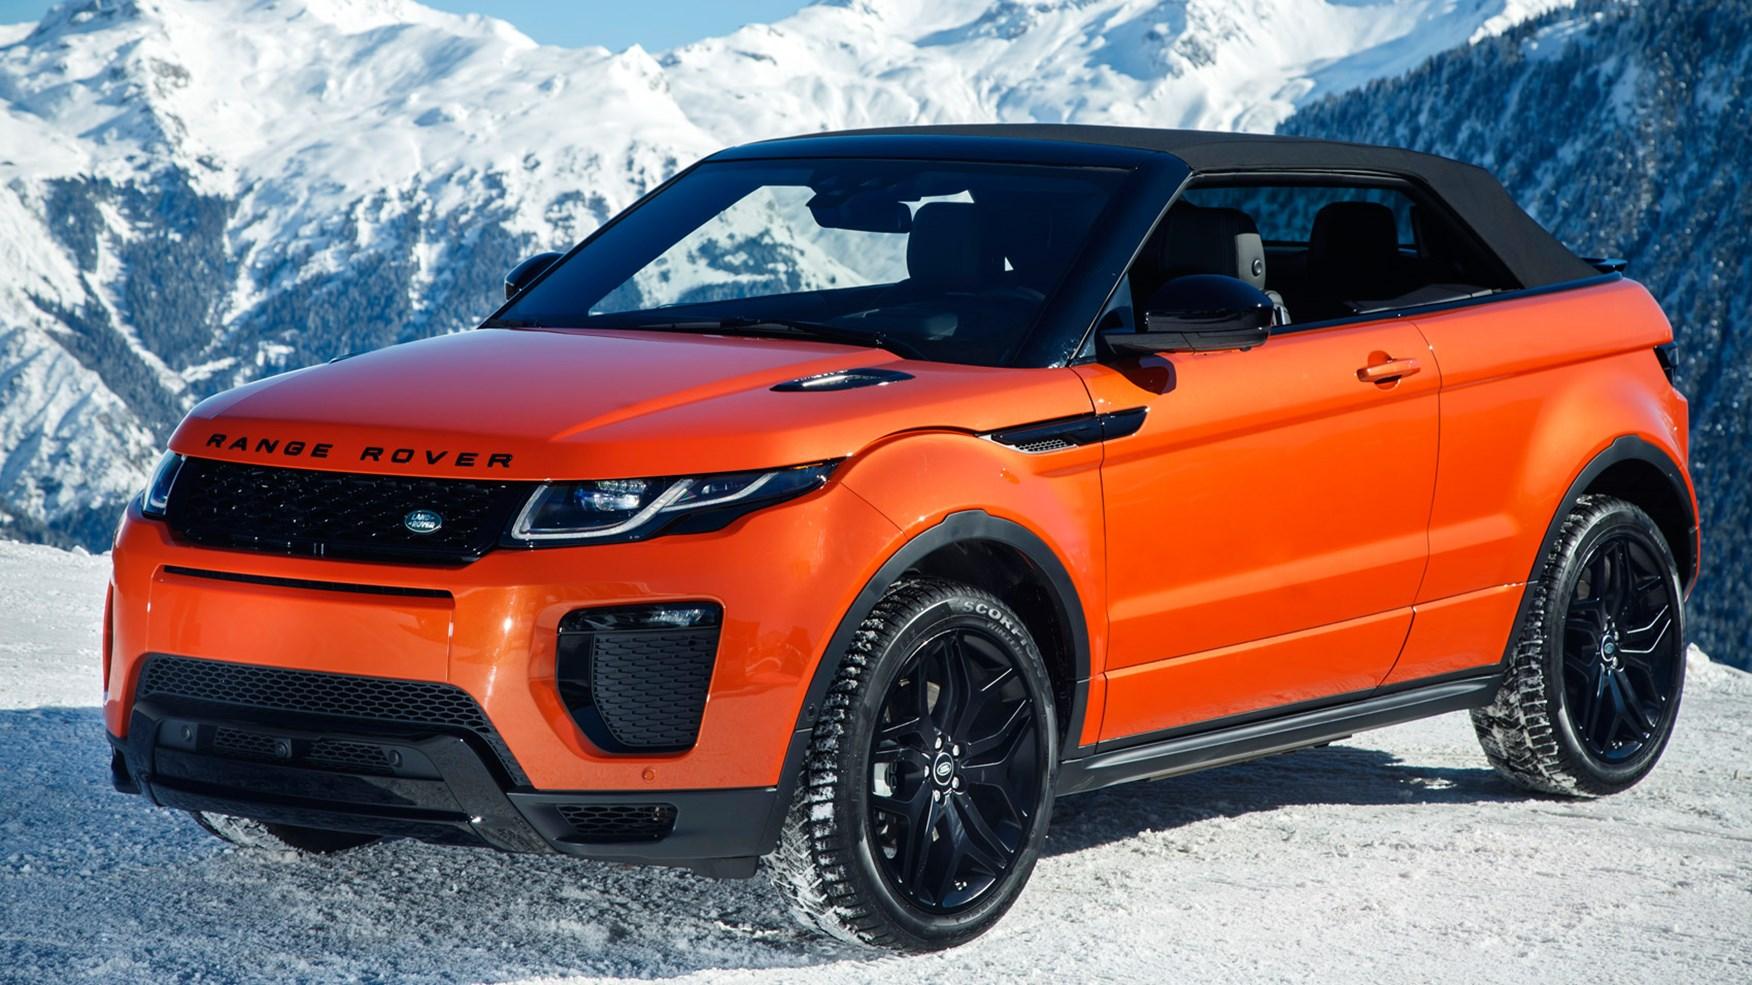 2018 Range Rover Velar Price In Sale - Range Rover Evoque Convertible 2.0D HSE Dynamic Lux (2016 ...